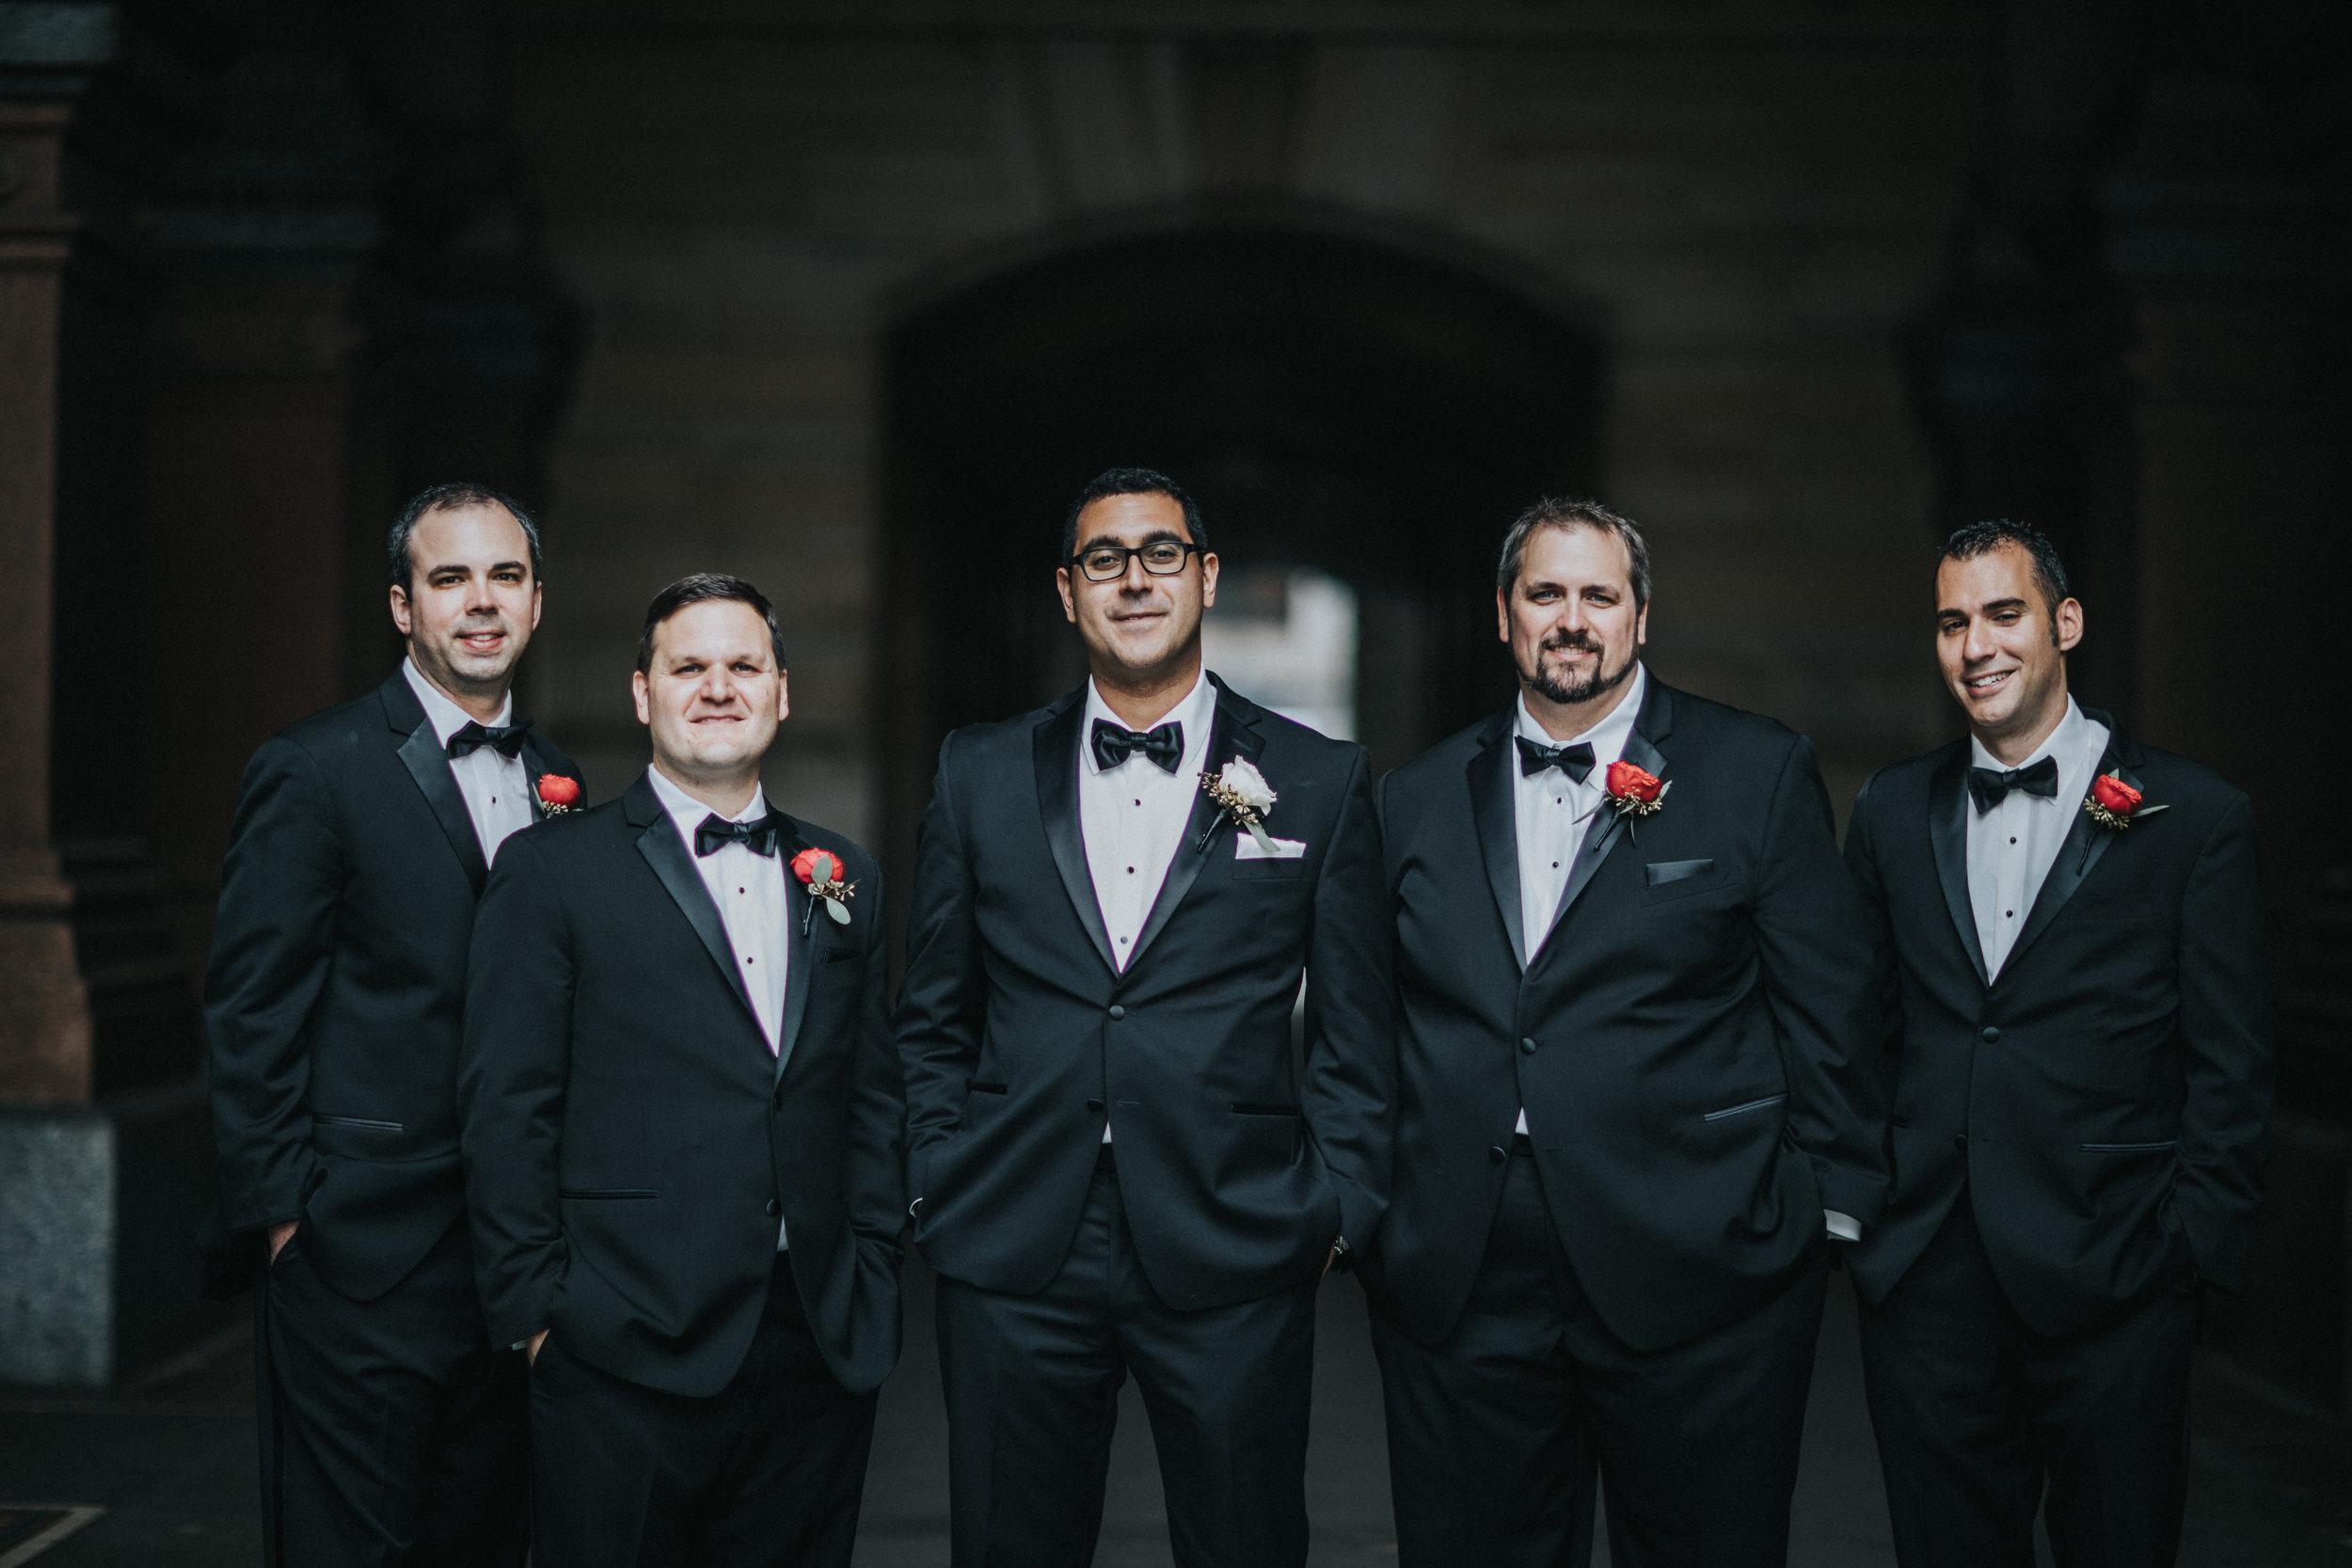 JennaLynnPhotography-NJWeddingPhotographer-Philadelphia-Wedding-ArtsBallroom-BridalParty-28.jpg